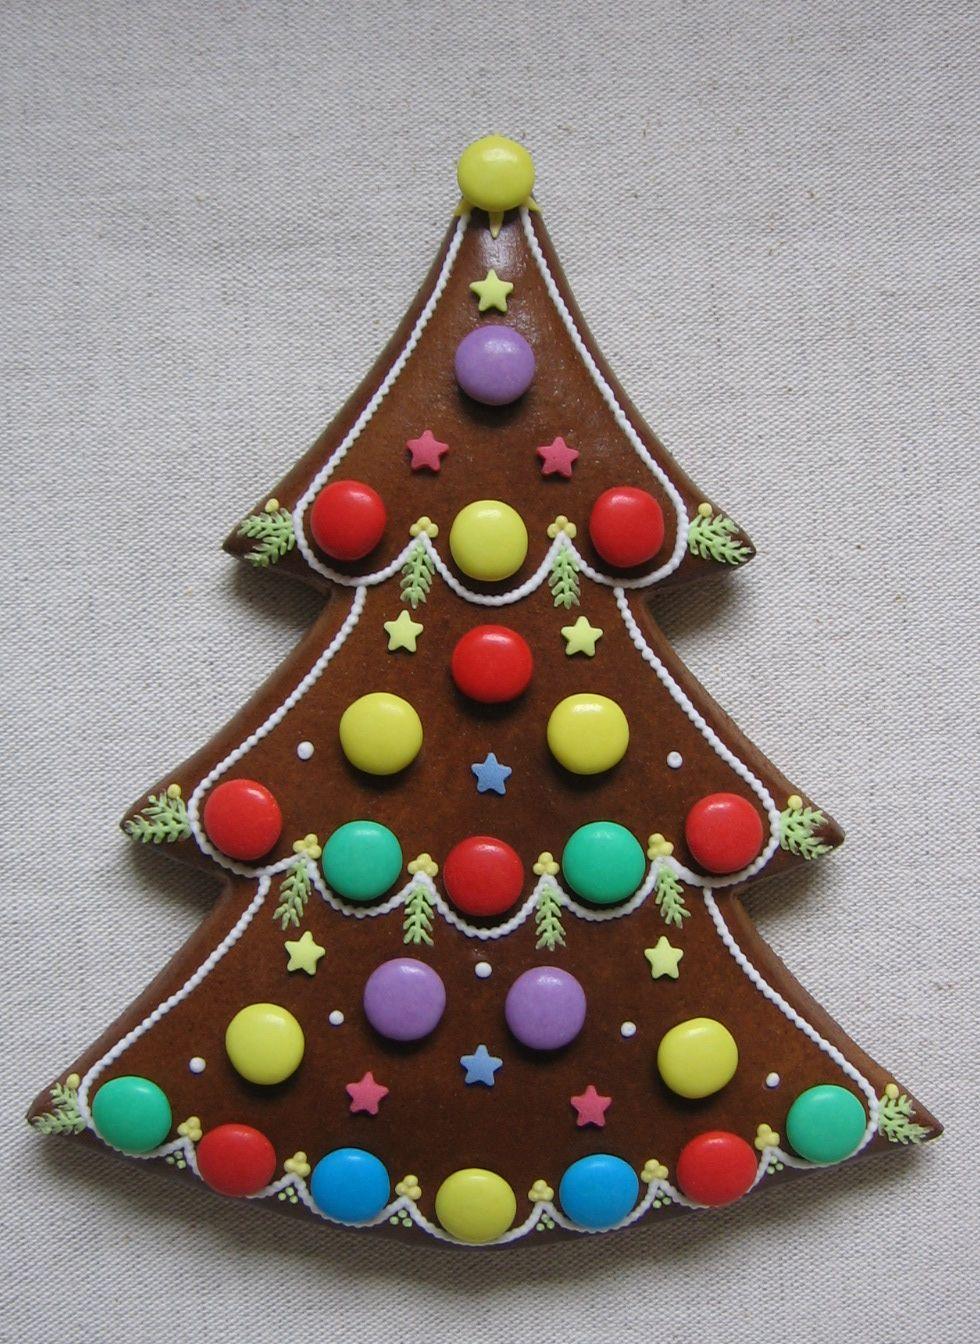 Navidad Christmas Cookies Decorated Christmas Cookies Christmas Sweets